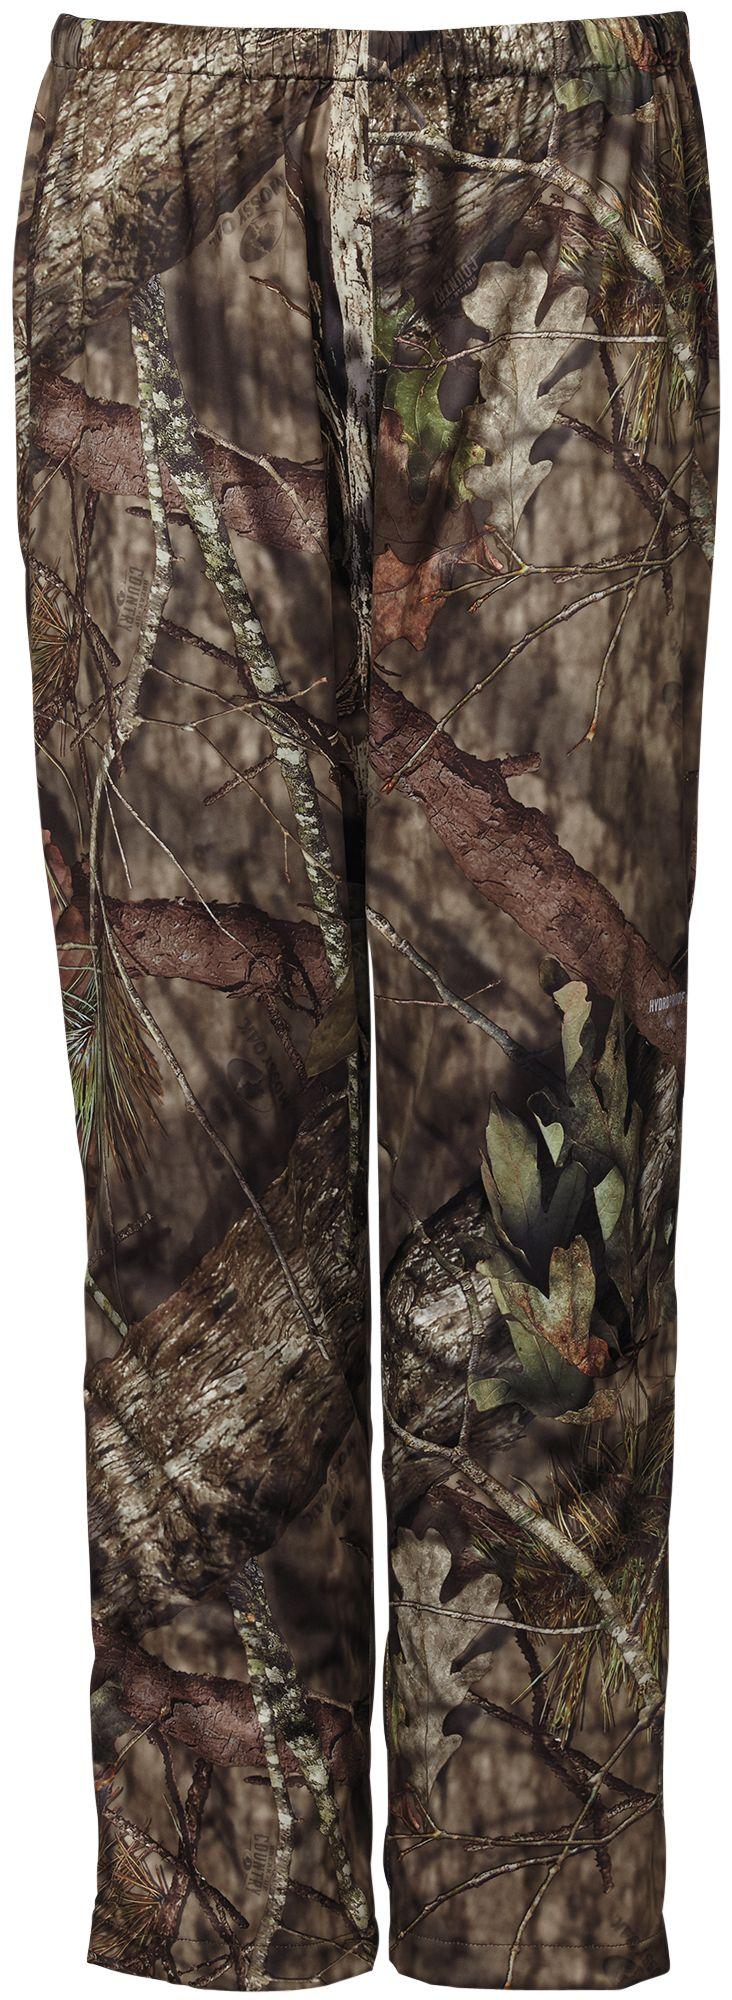 Field & Stream Men's Lightweight Packable Rain Hunting Pants, Size: XXXL, Mossy Oak Brk-Up Country thumbnail